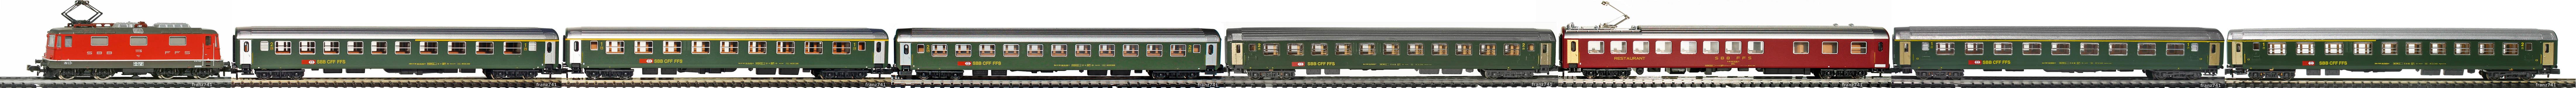 Epoche-IV-SBB-UIC-Personenzug_Re-4-4-II-Elok-UIC-Wagen-neues-Logo